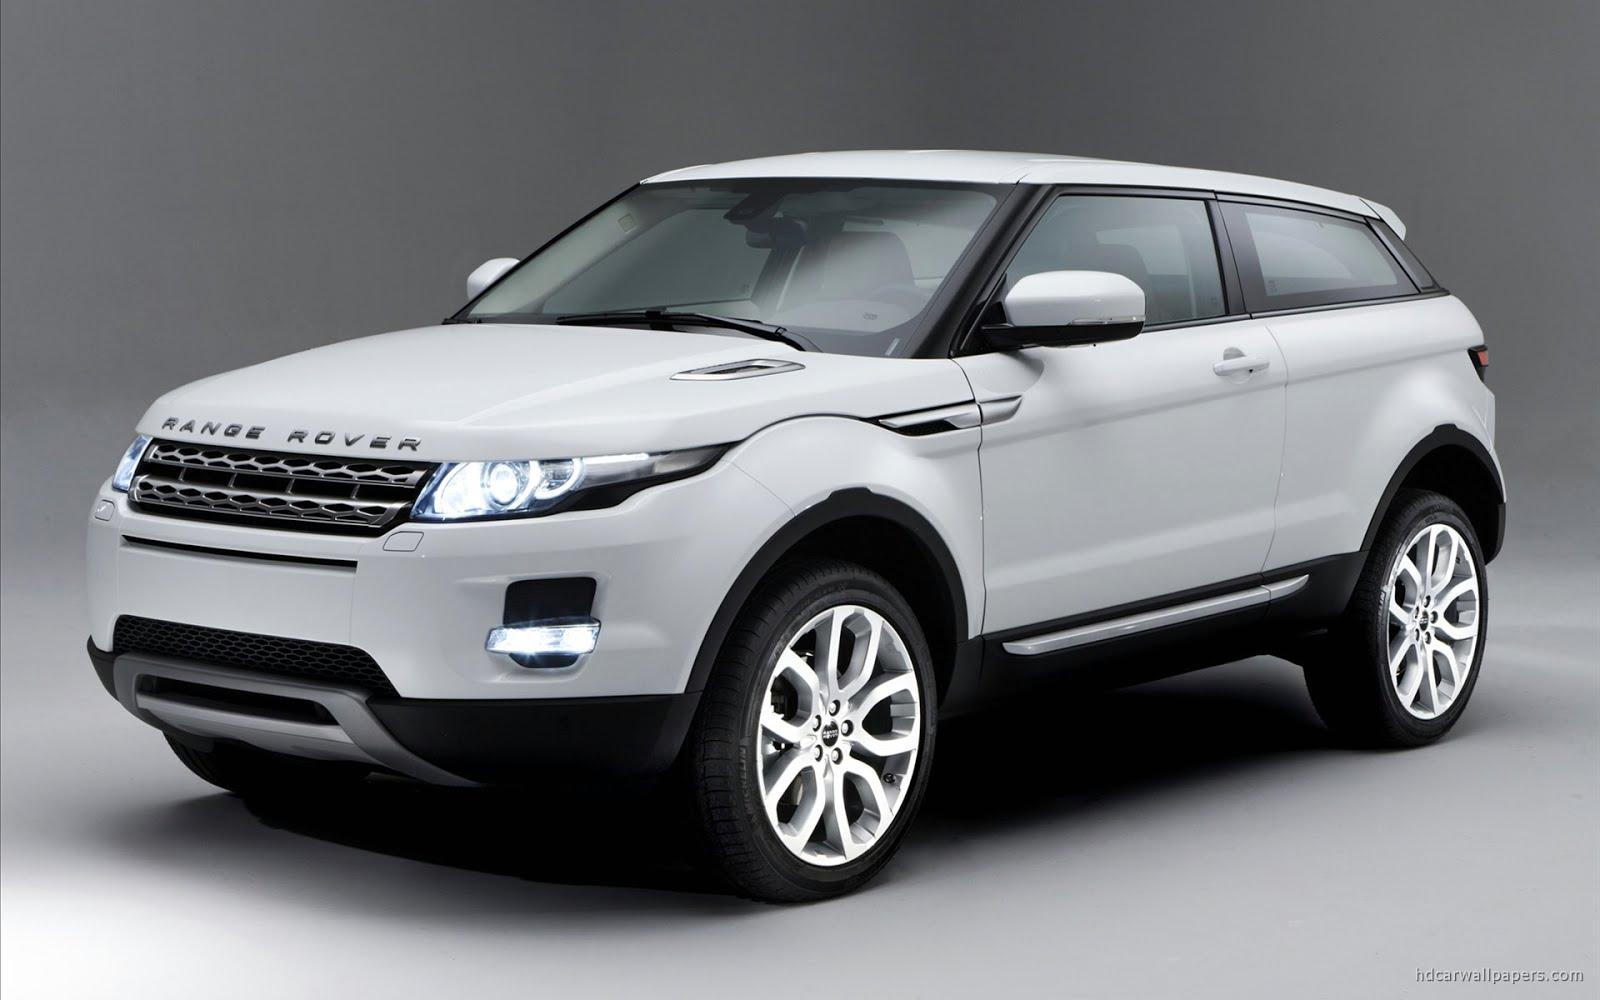 range rover download free car wallpaper | free download cars wallpapers